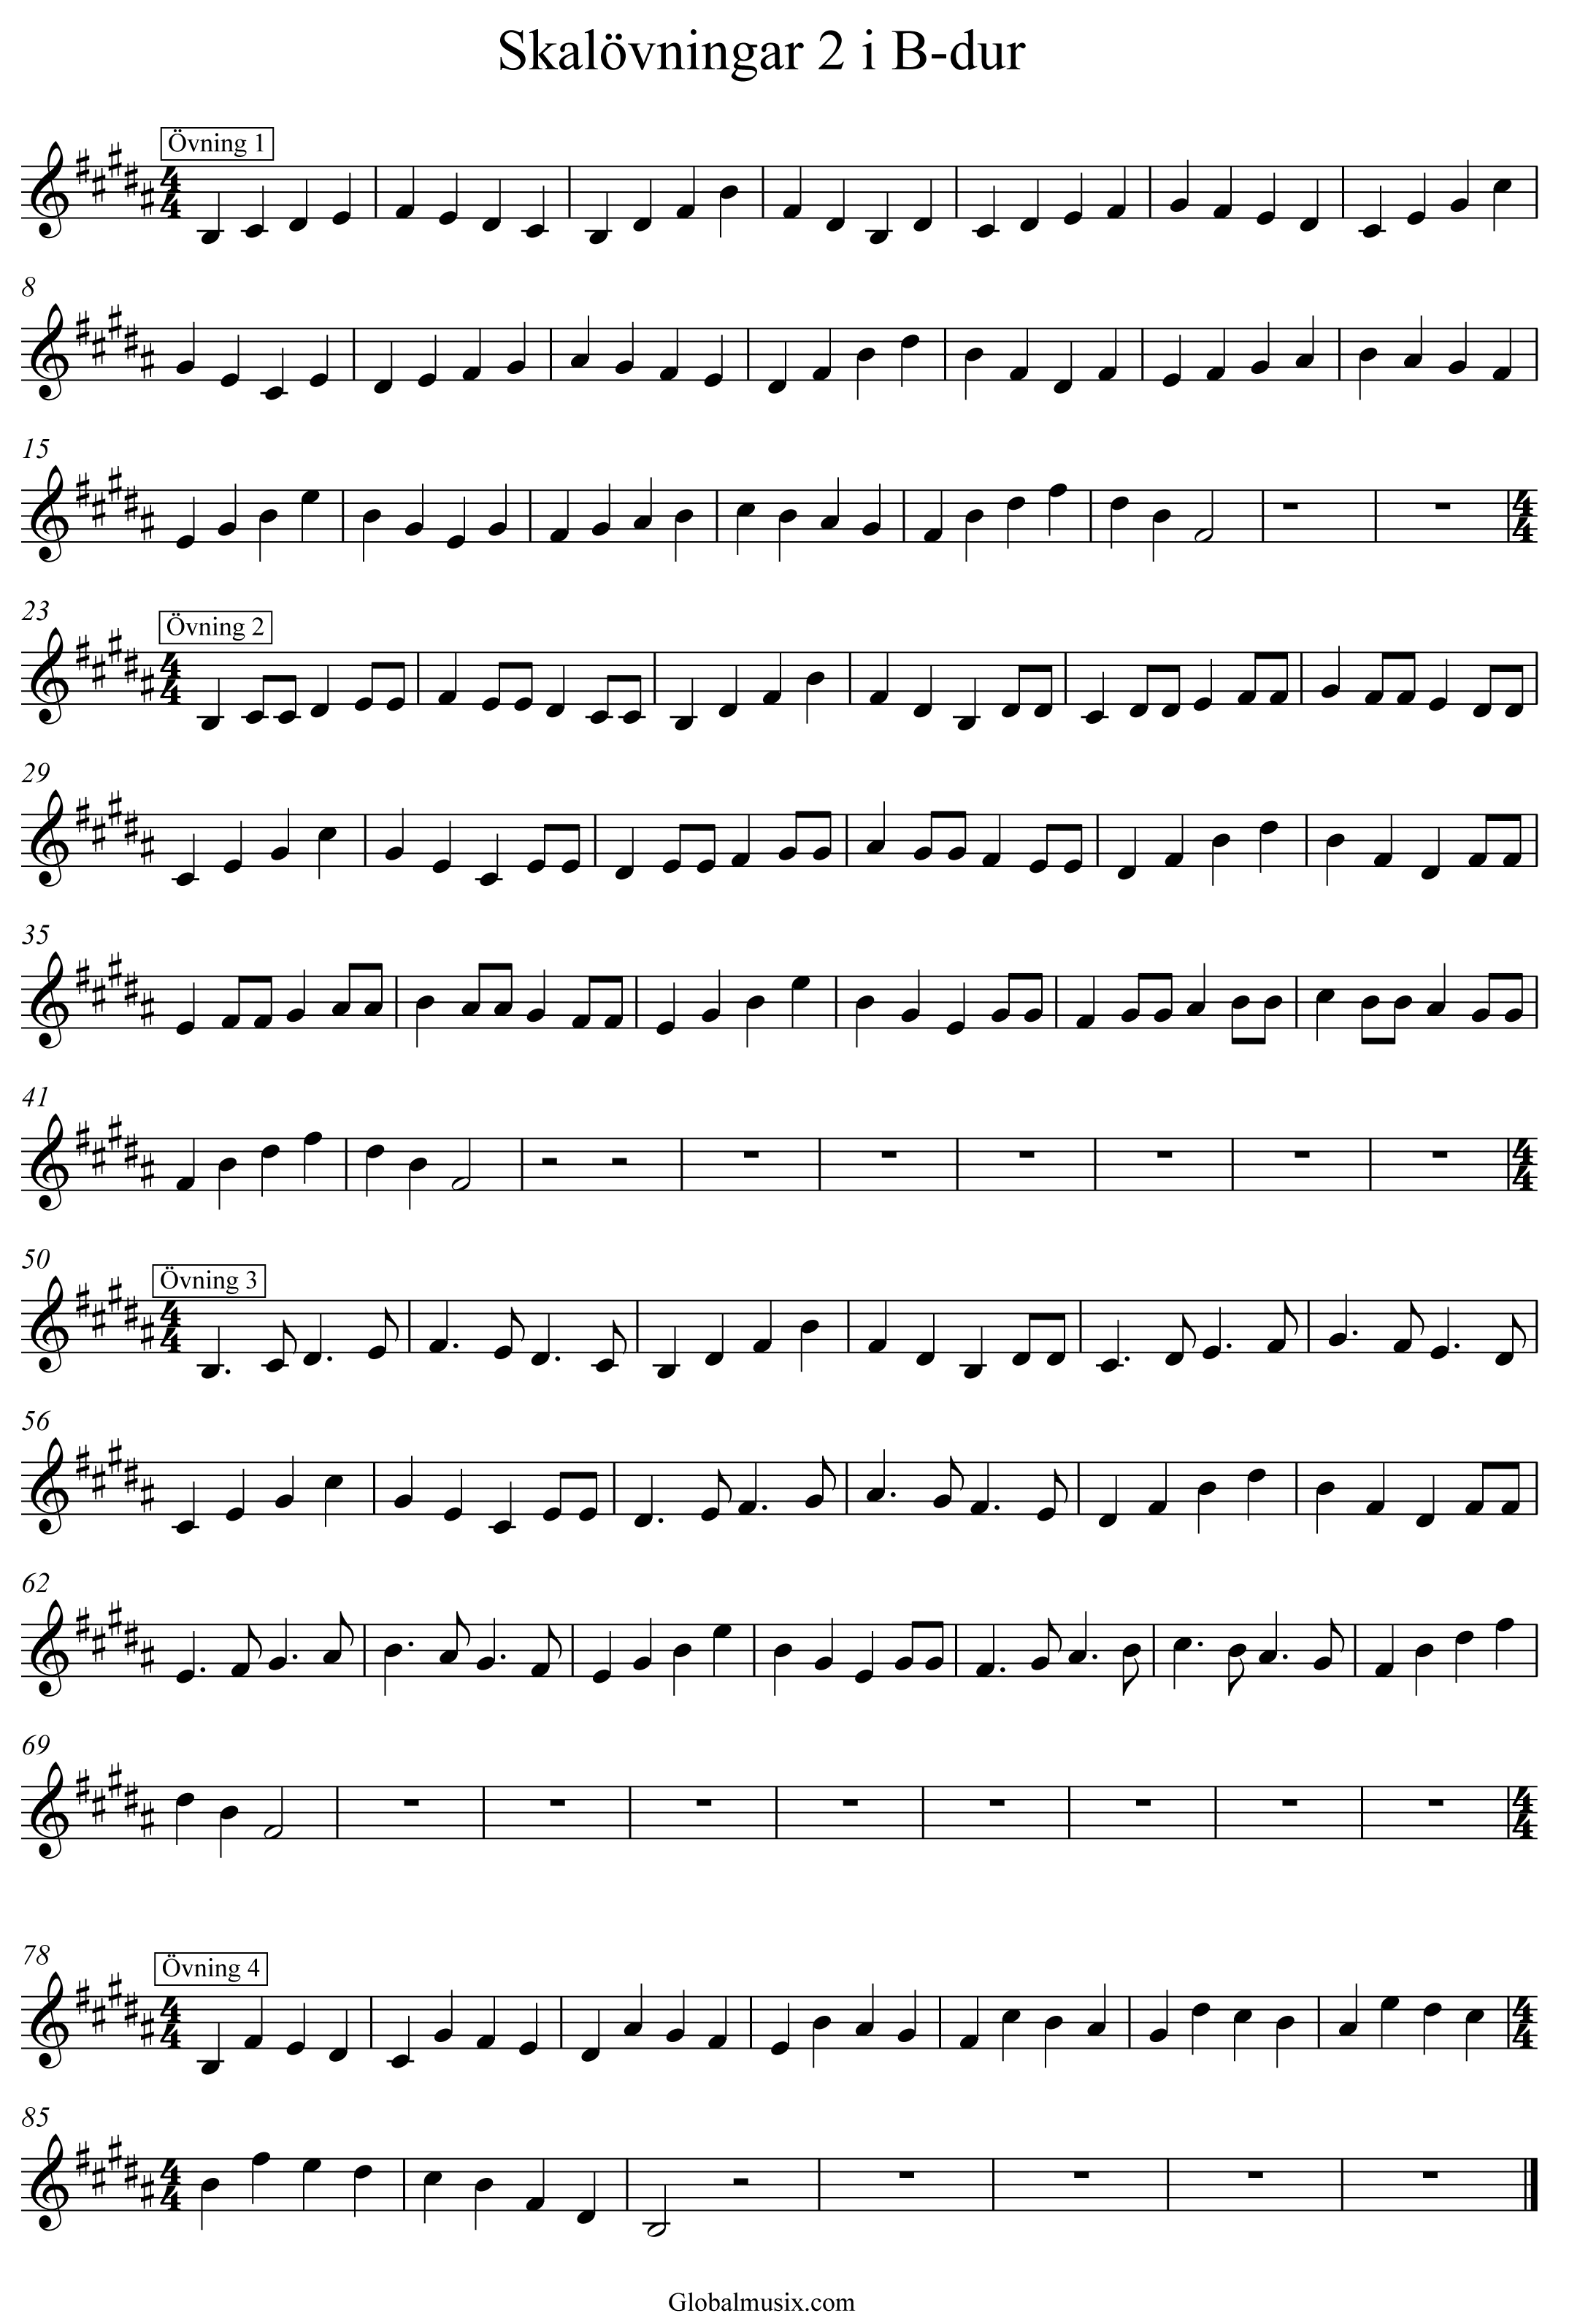 Enkla skalövningar 1 i B-dur